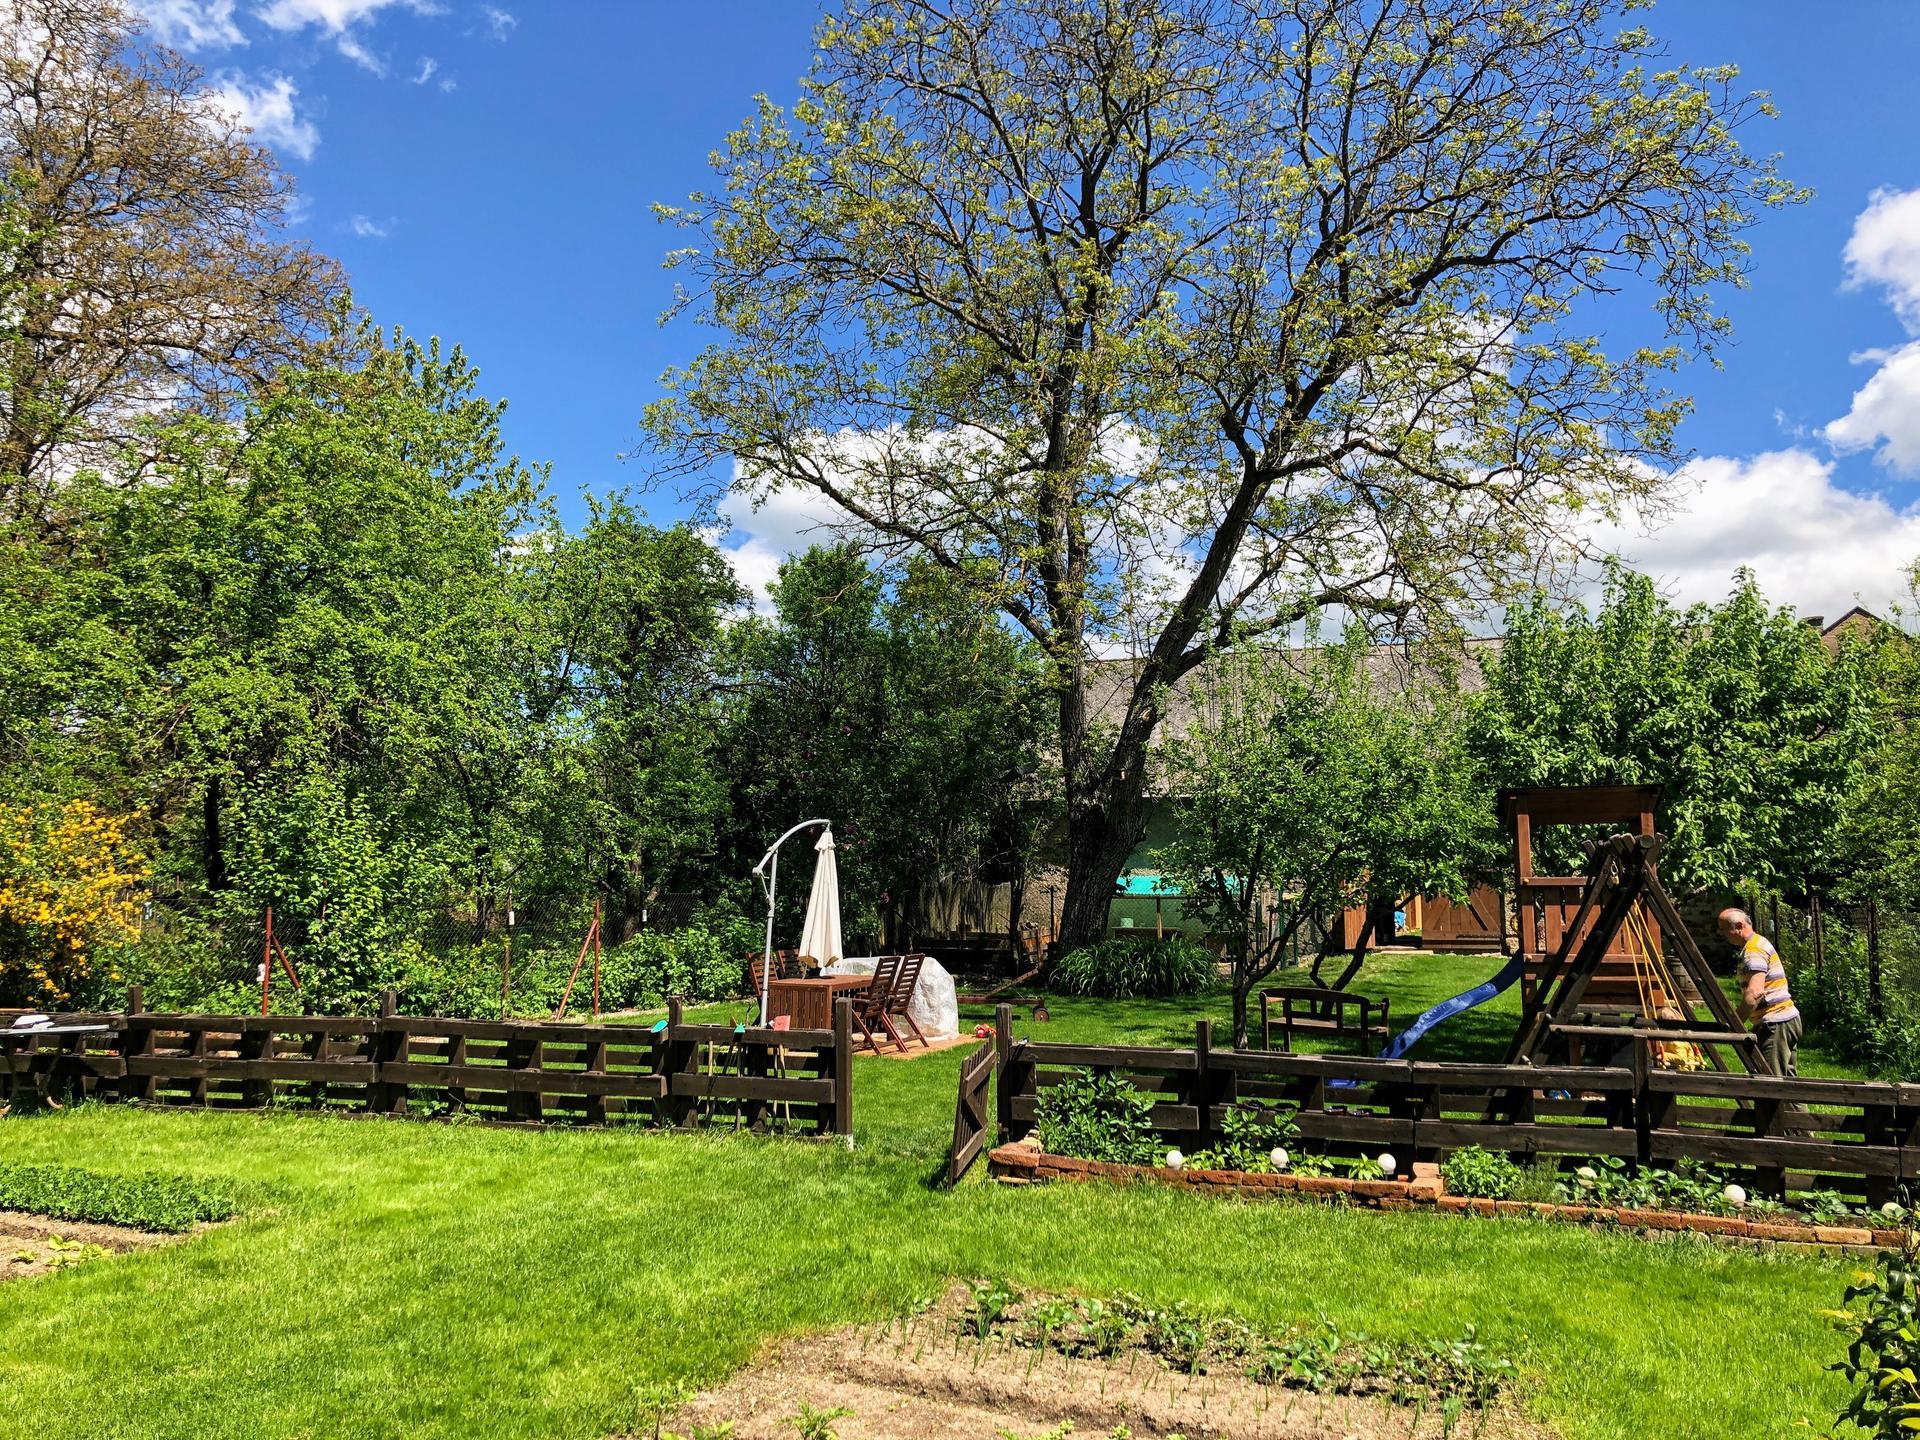 Zahrada a upravy okolo domu - 2021 setup ,novy plot a brana